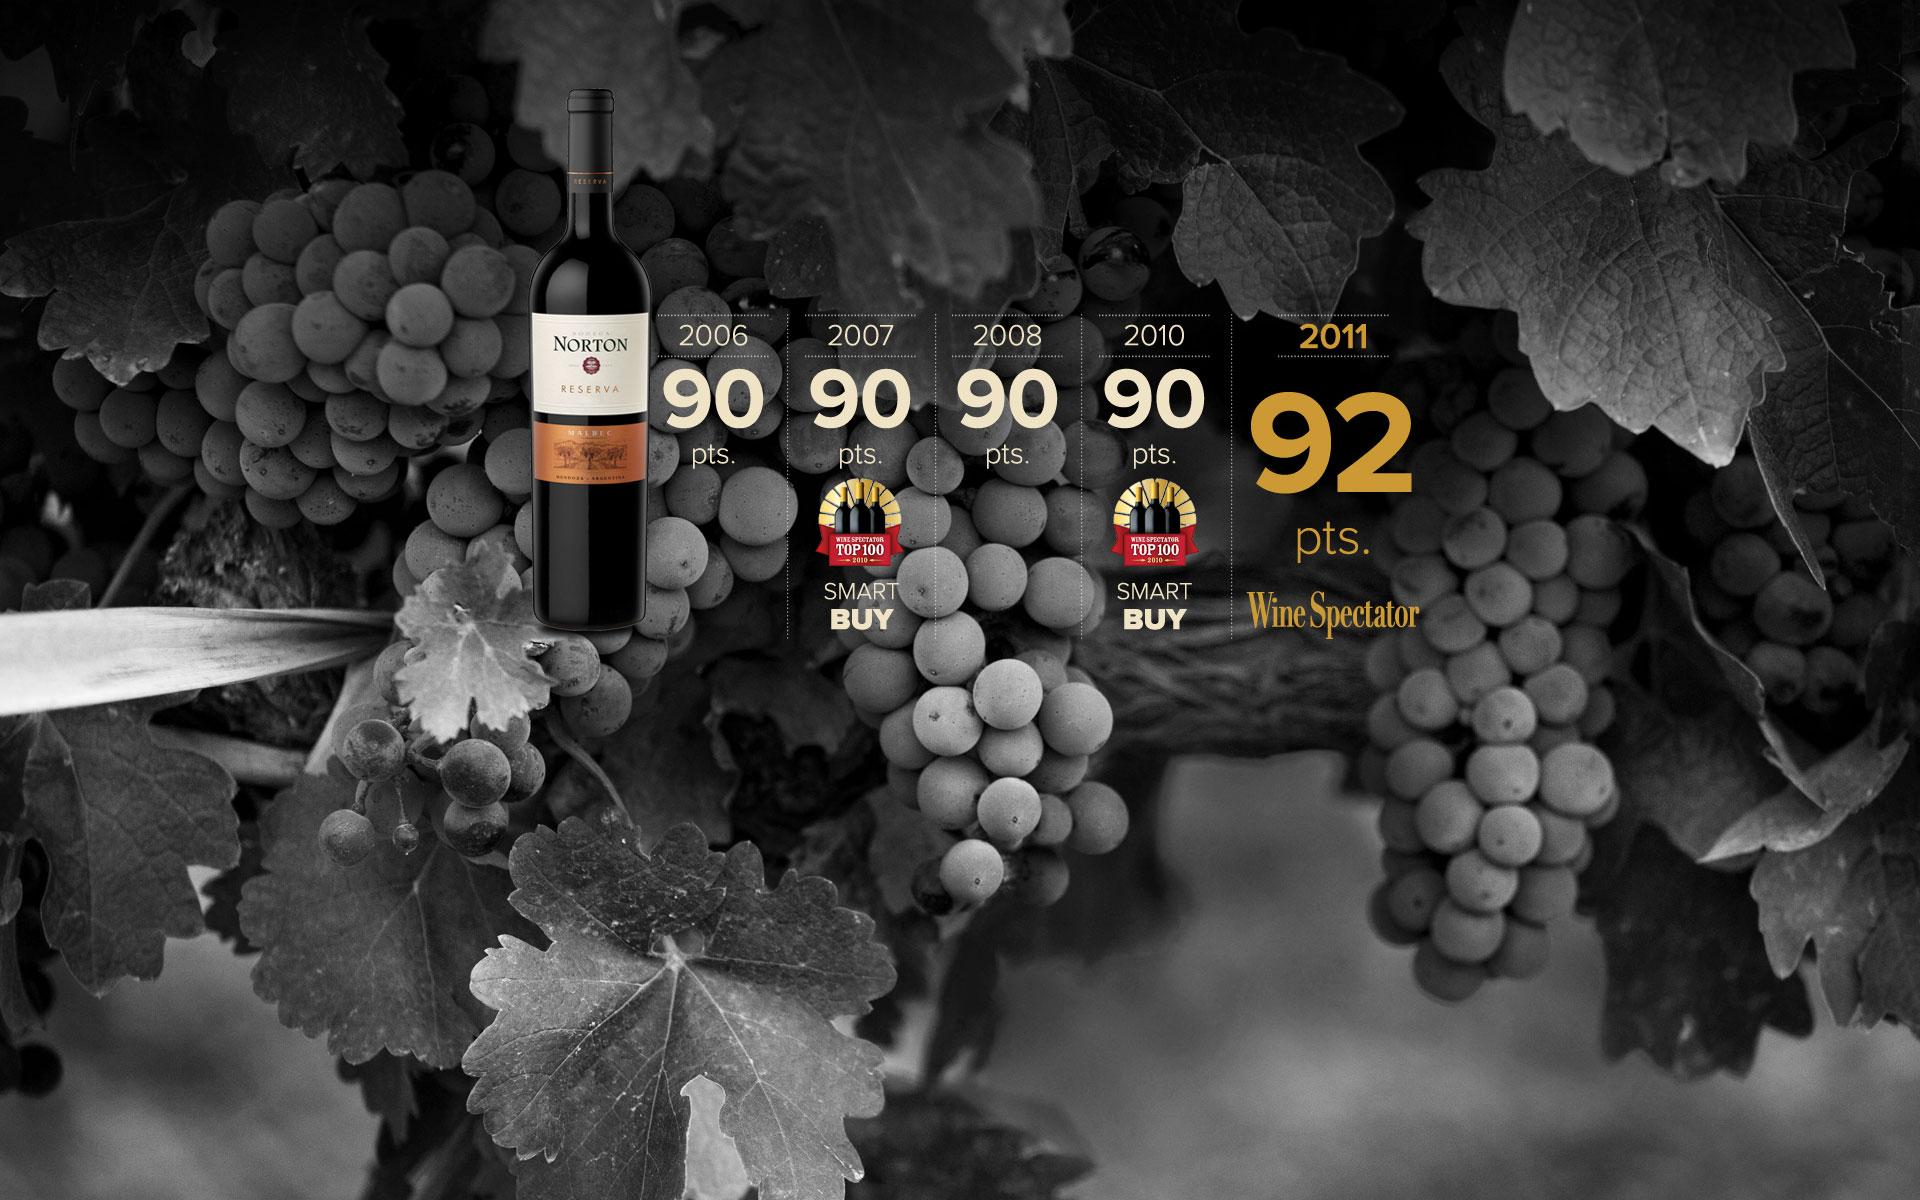 bodega-norton-wine-spectator